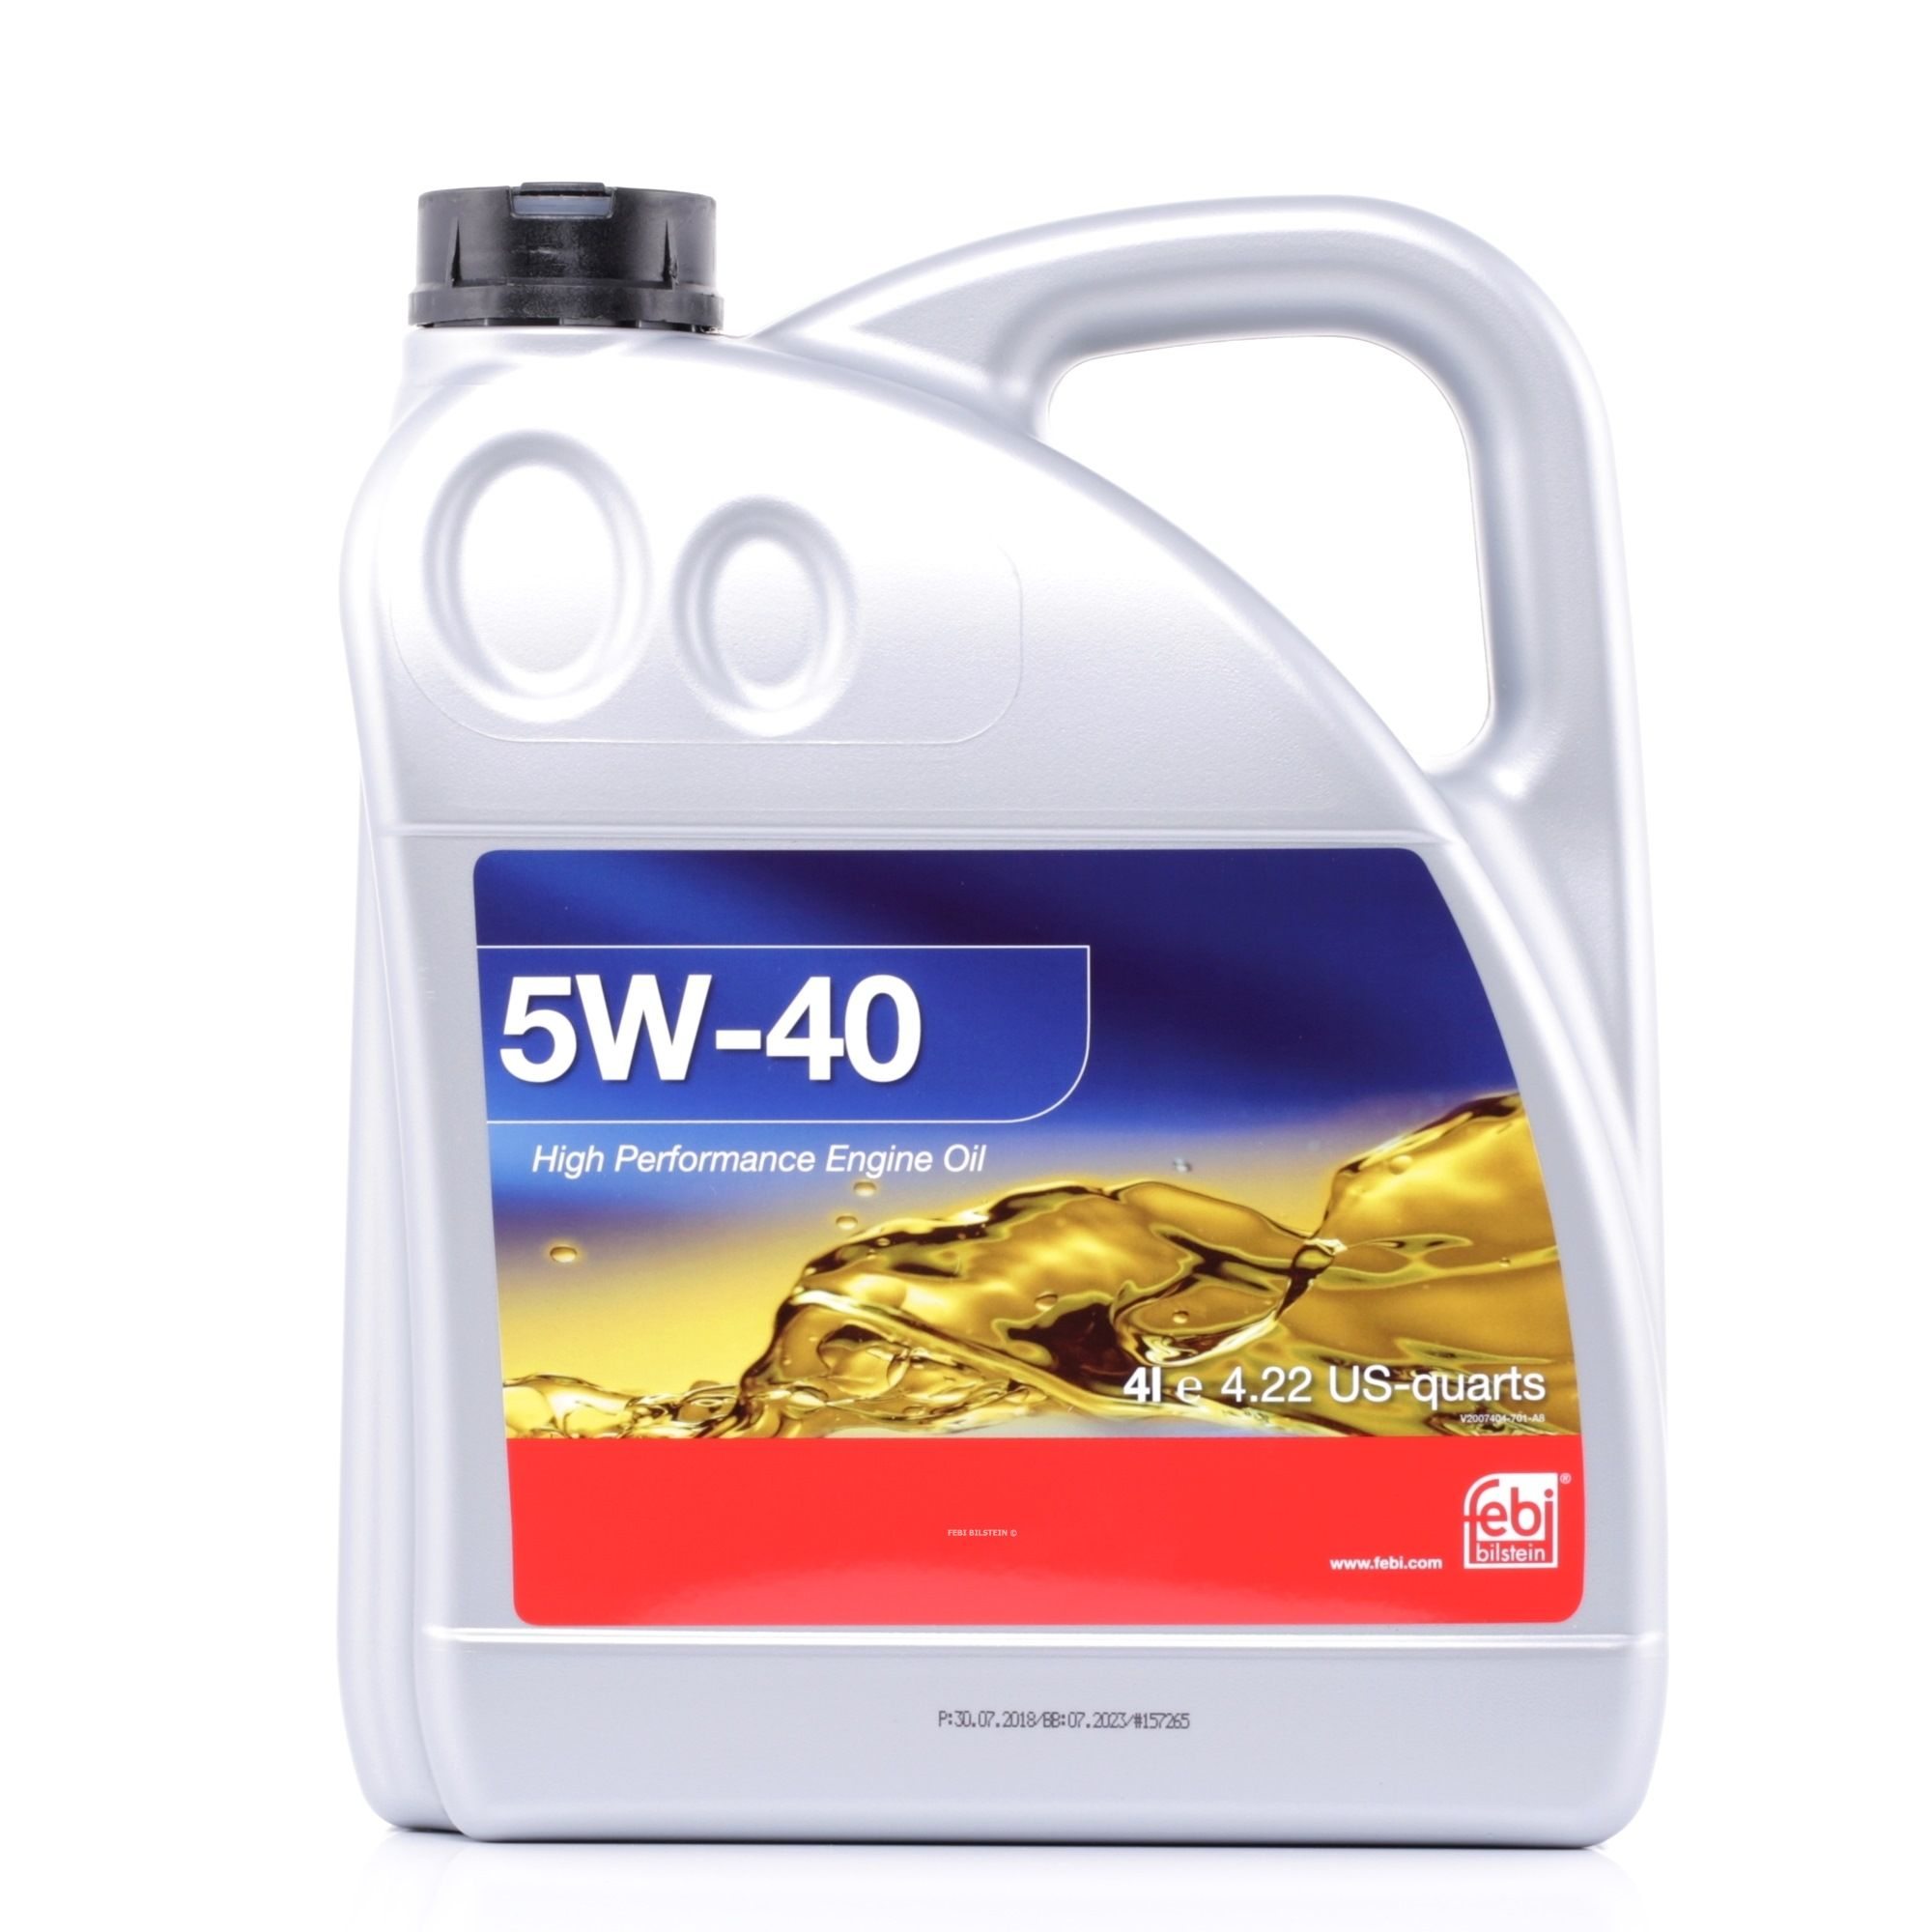 VW50500 FEBI BILSTEIN 5W-40, 4l, Synthetiköl Motoröl 32937 günstig kaufen